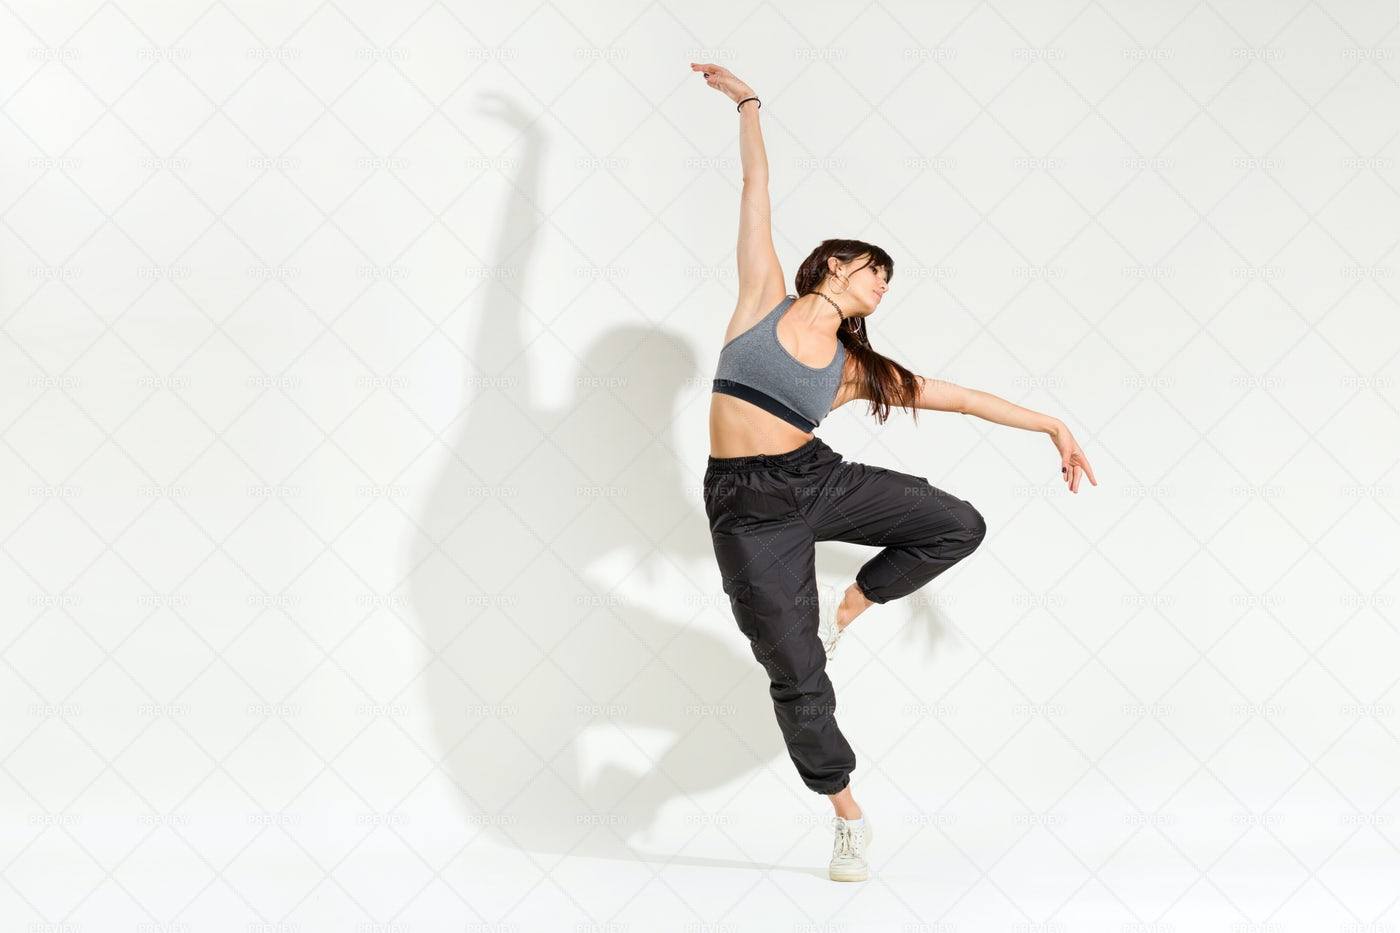 Dancer Performing A Dance Pose: Stock Photos